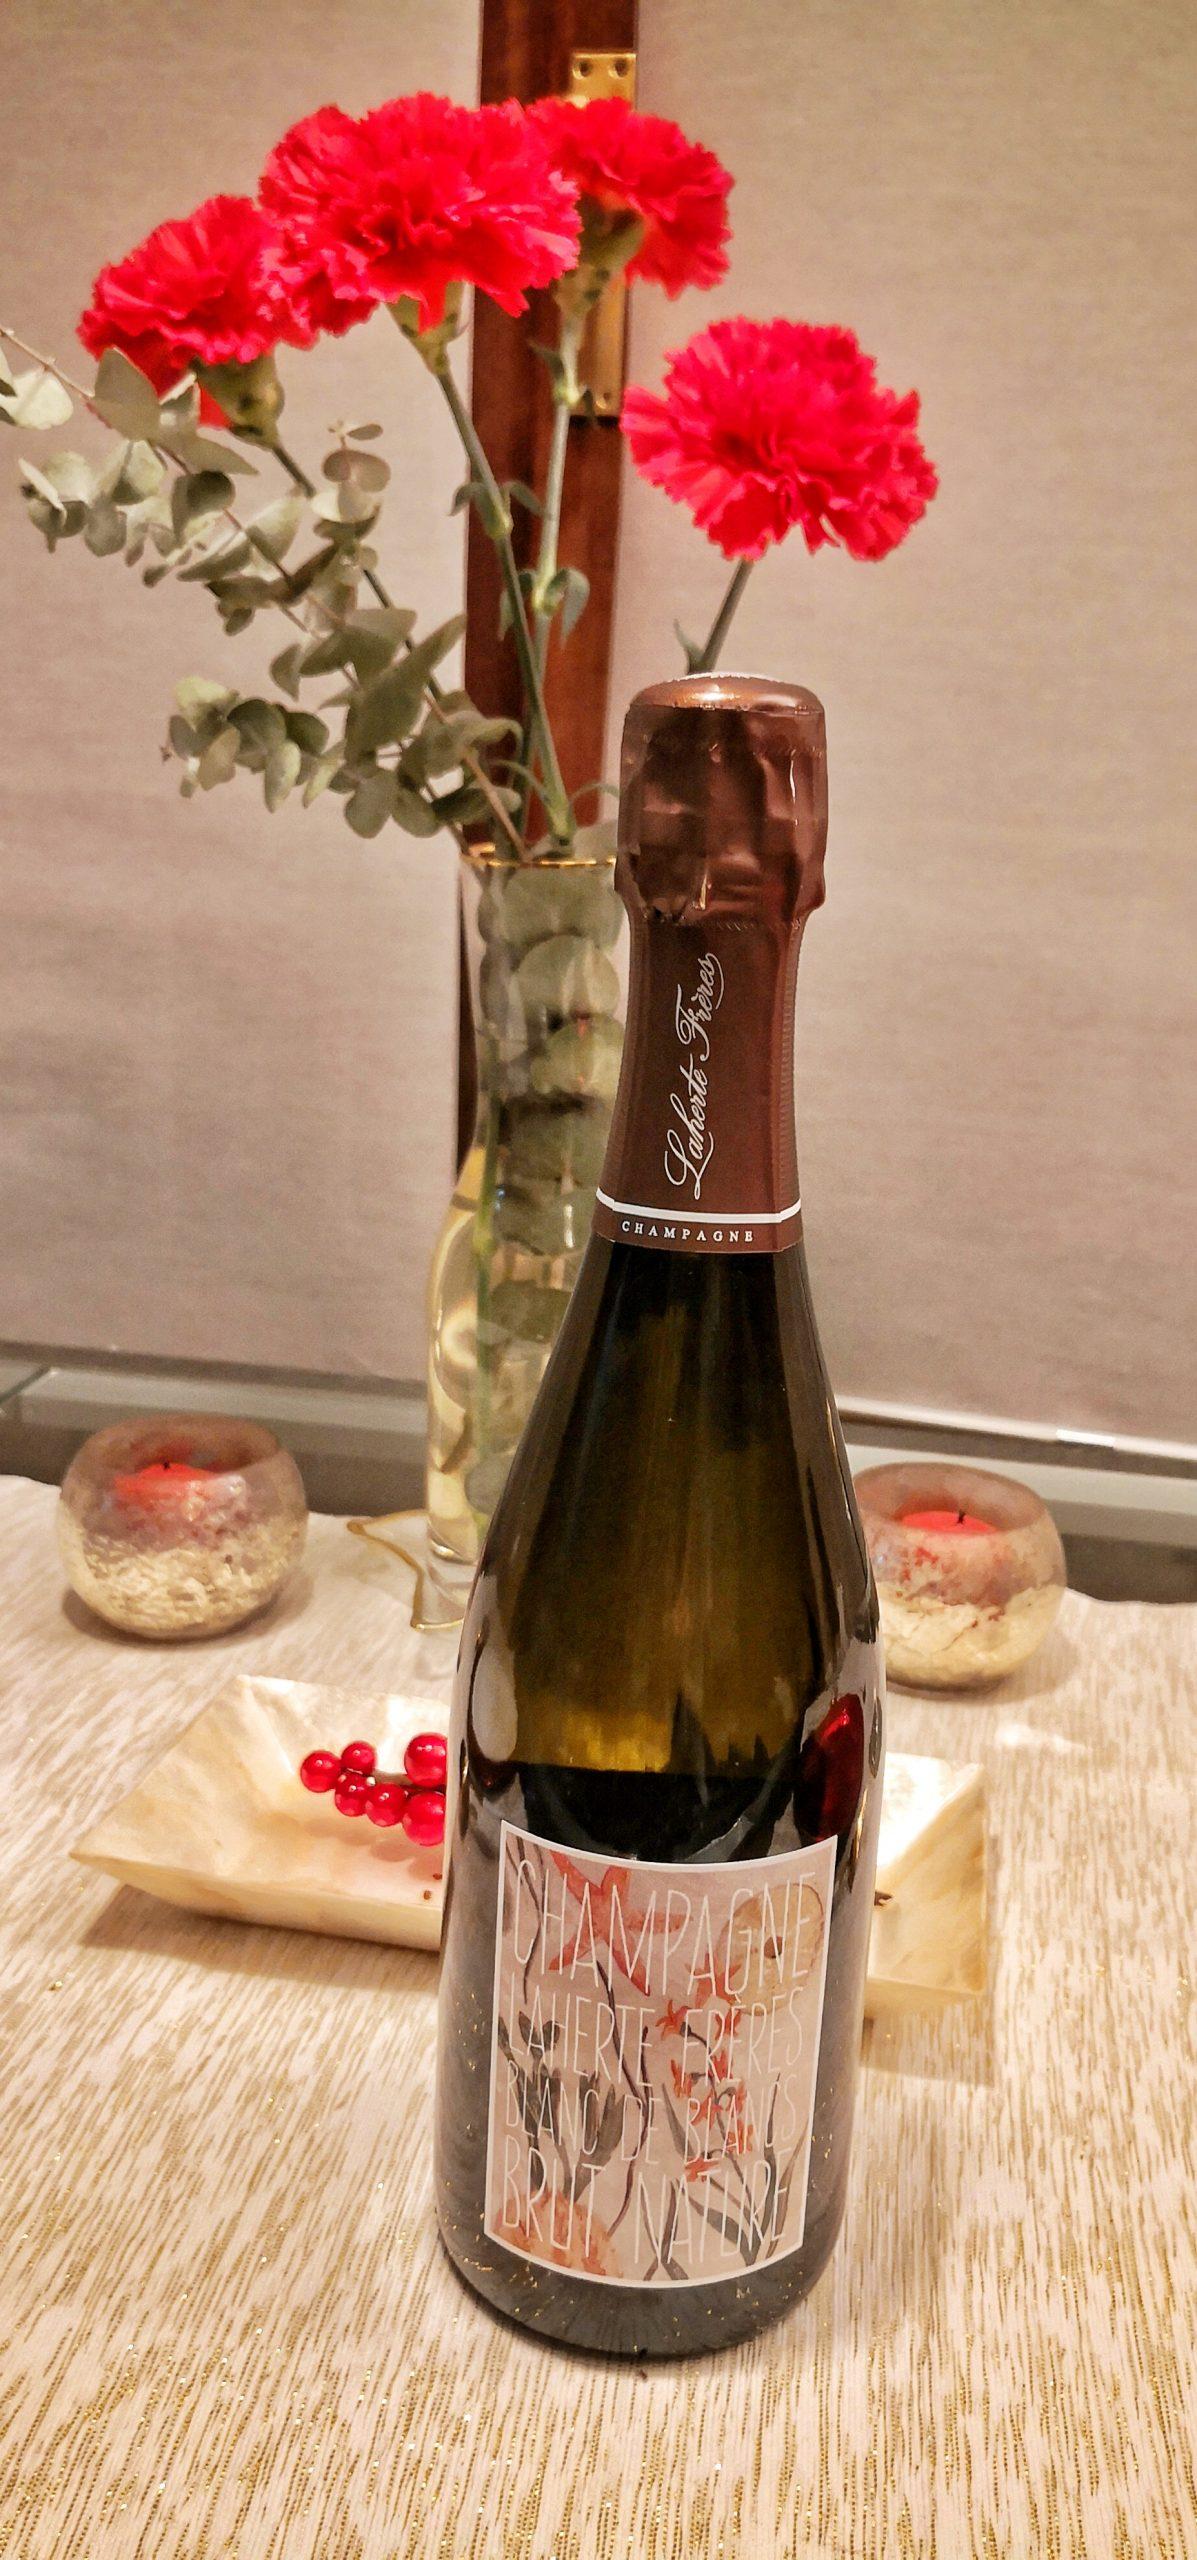 Champagne gastro dating Miss Maridajes